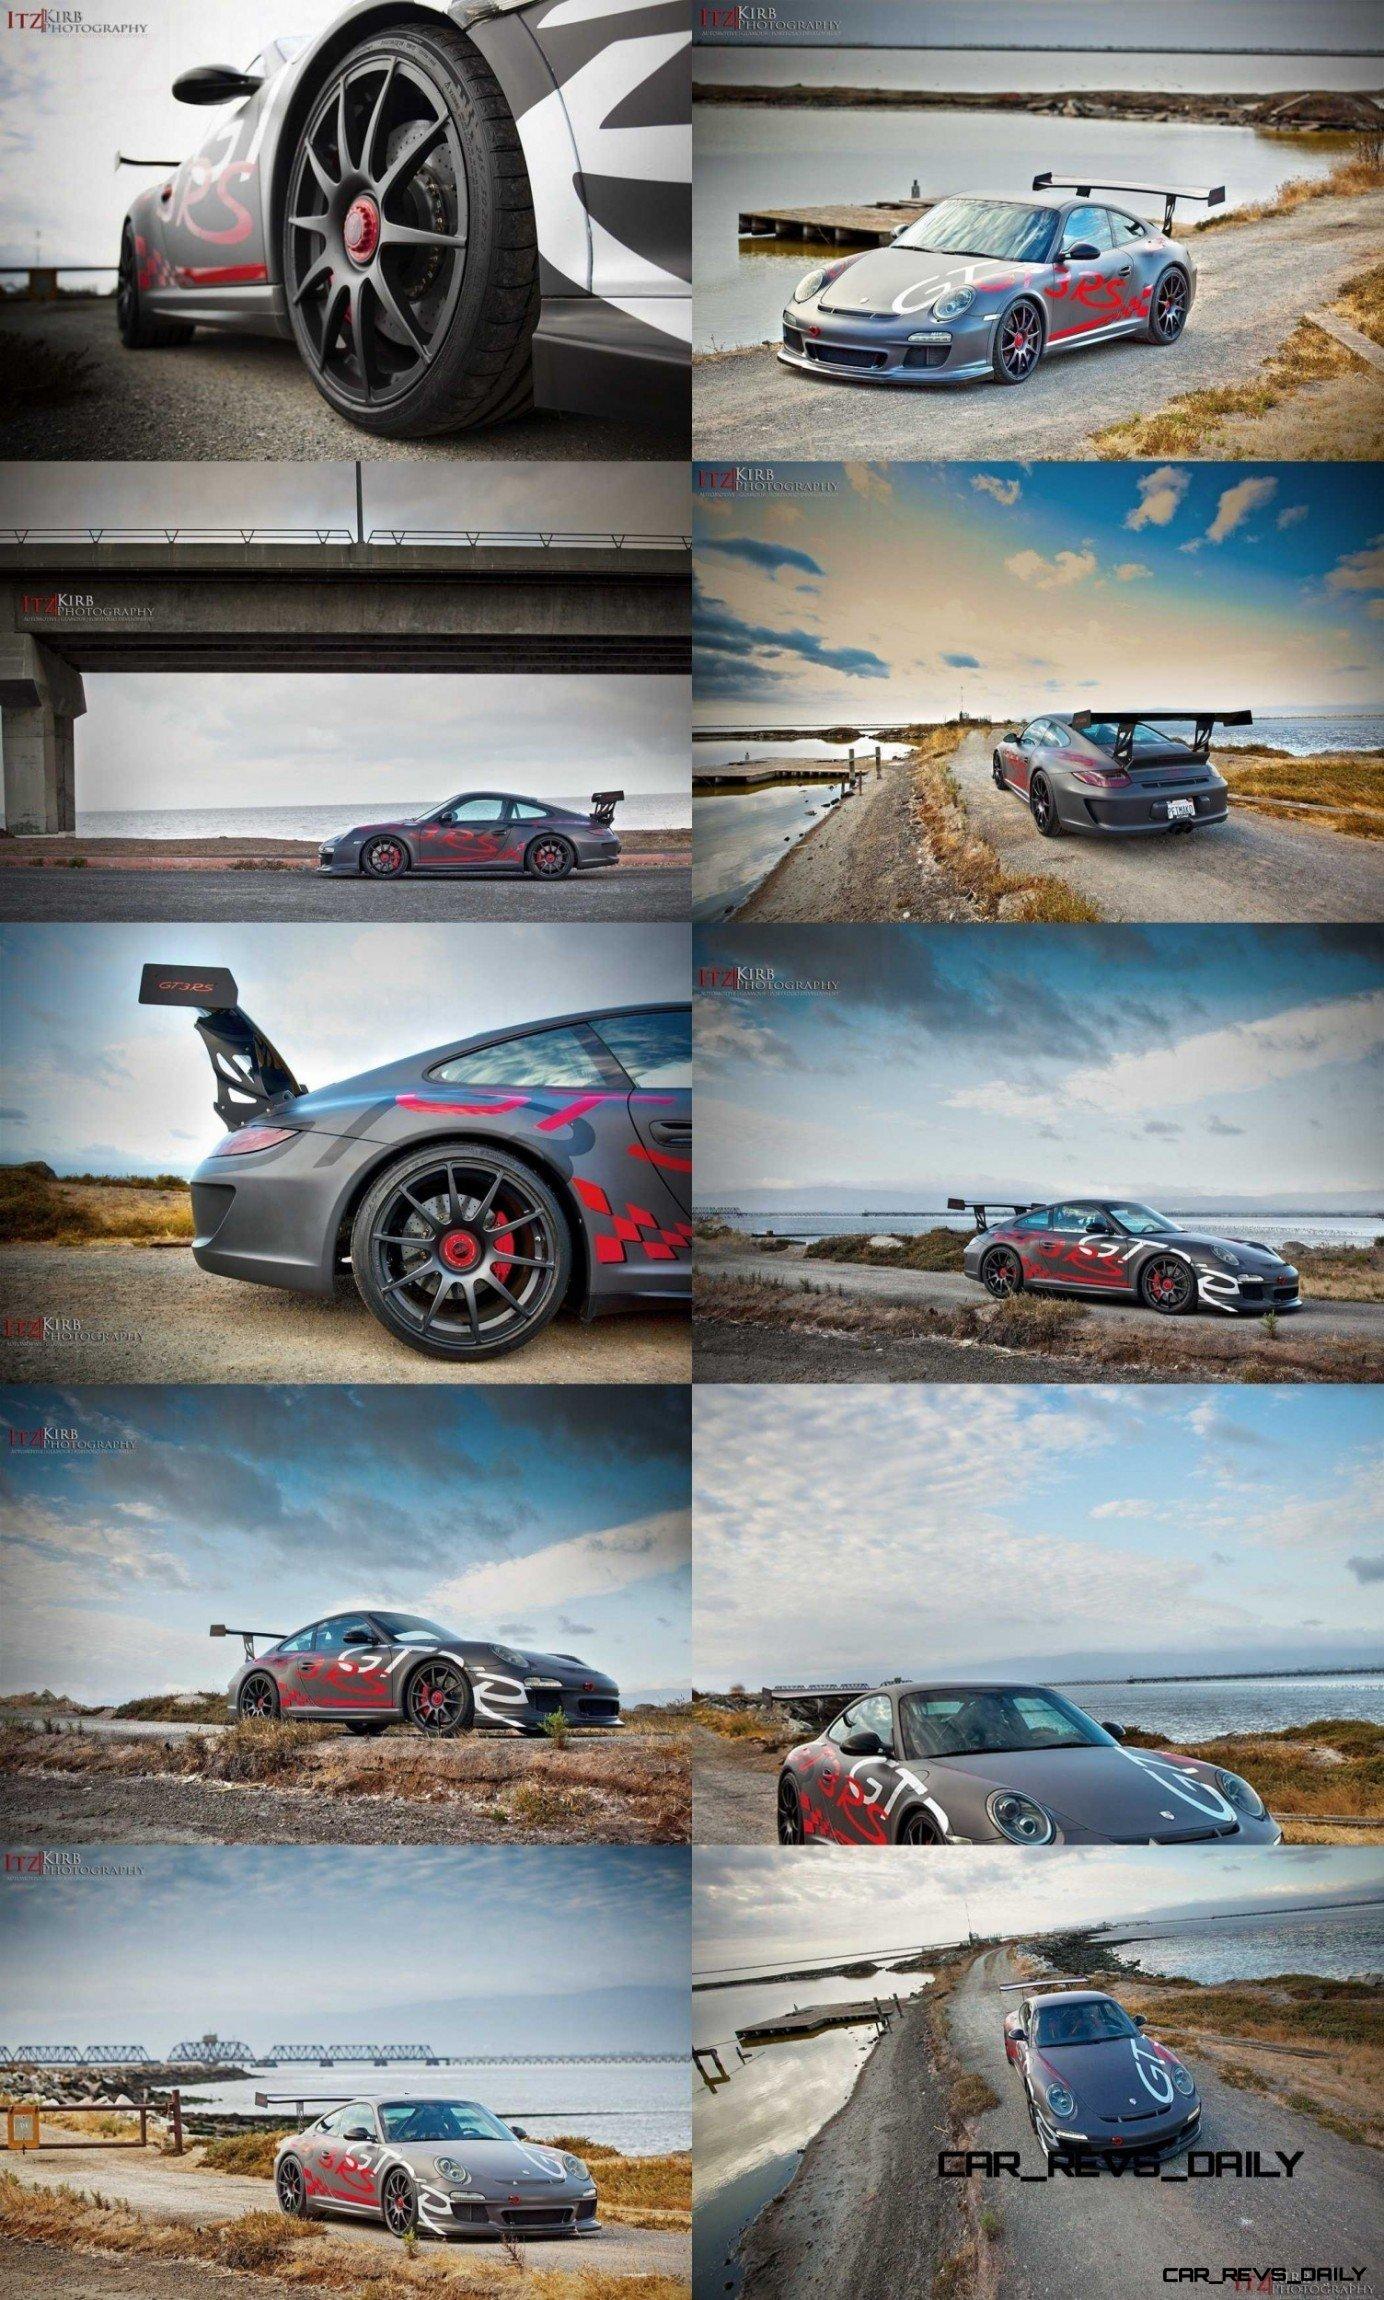 ItzKirb Captures the Wild Graphics of this Porsche 911 GT3 RS 5-tile